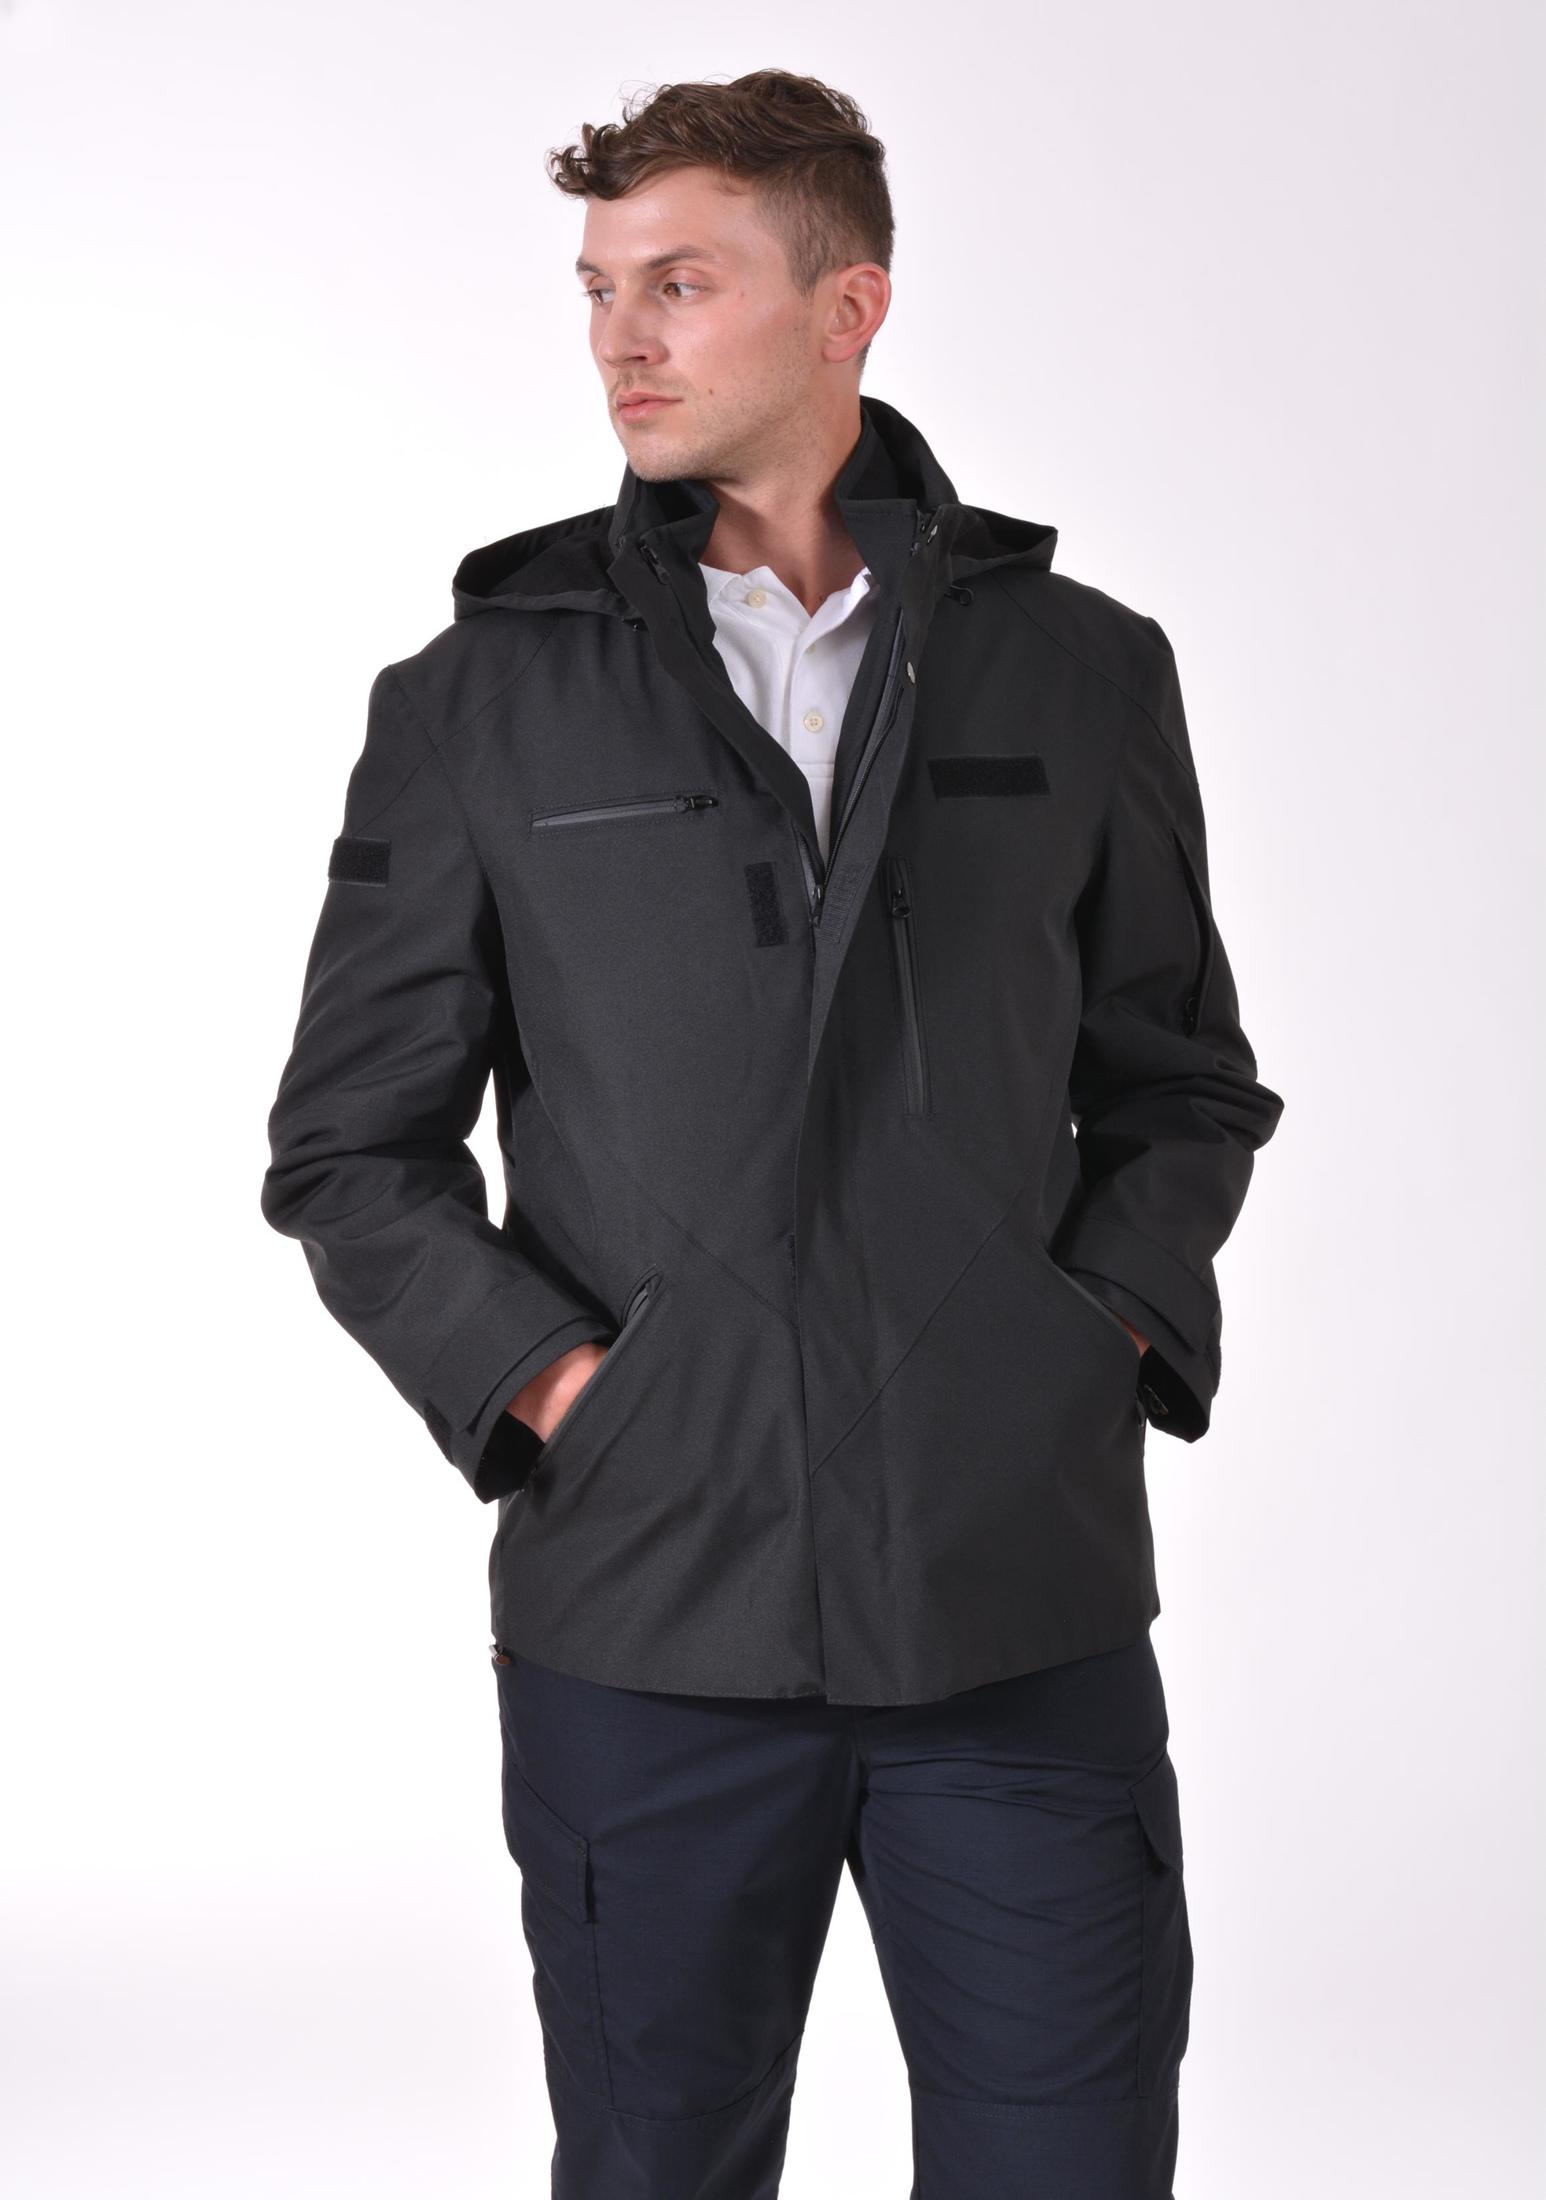 men's jacket 3u1, hardshell, underjacket dettachable, muška jakna 3u1 hardshell, podjakna